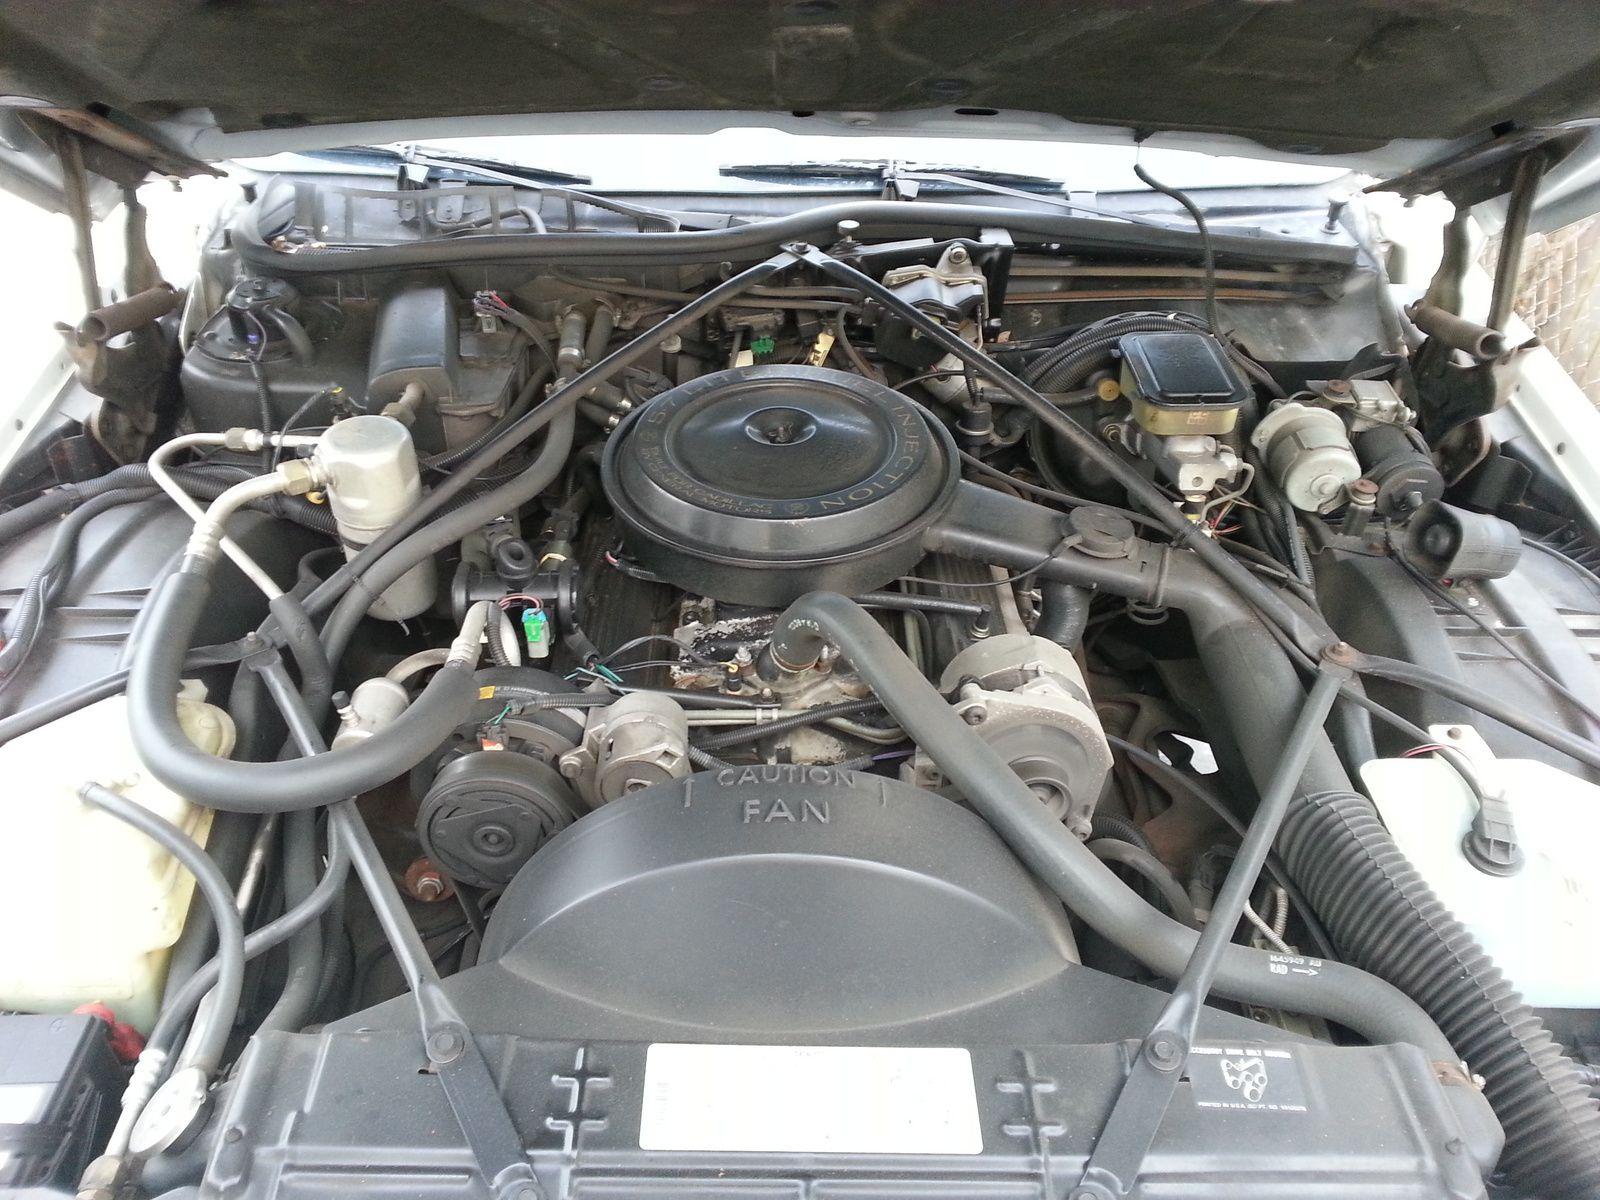 1994 Cadillac Fleetwood Used Engine Description: Gas Engine 5.7, 8 ...